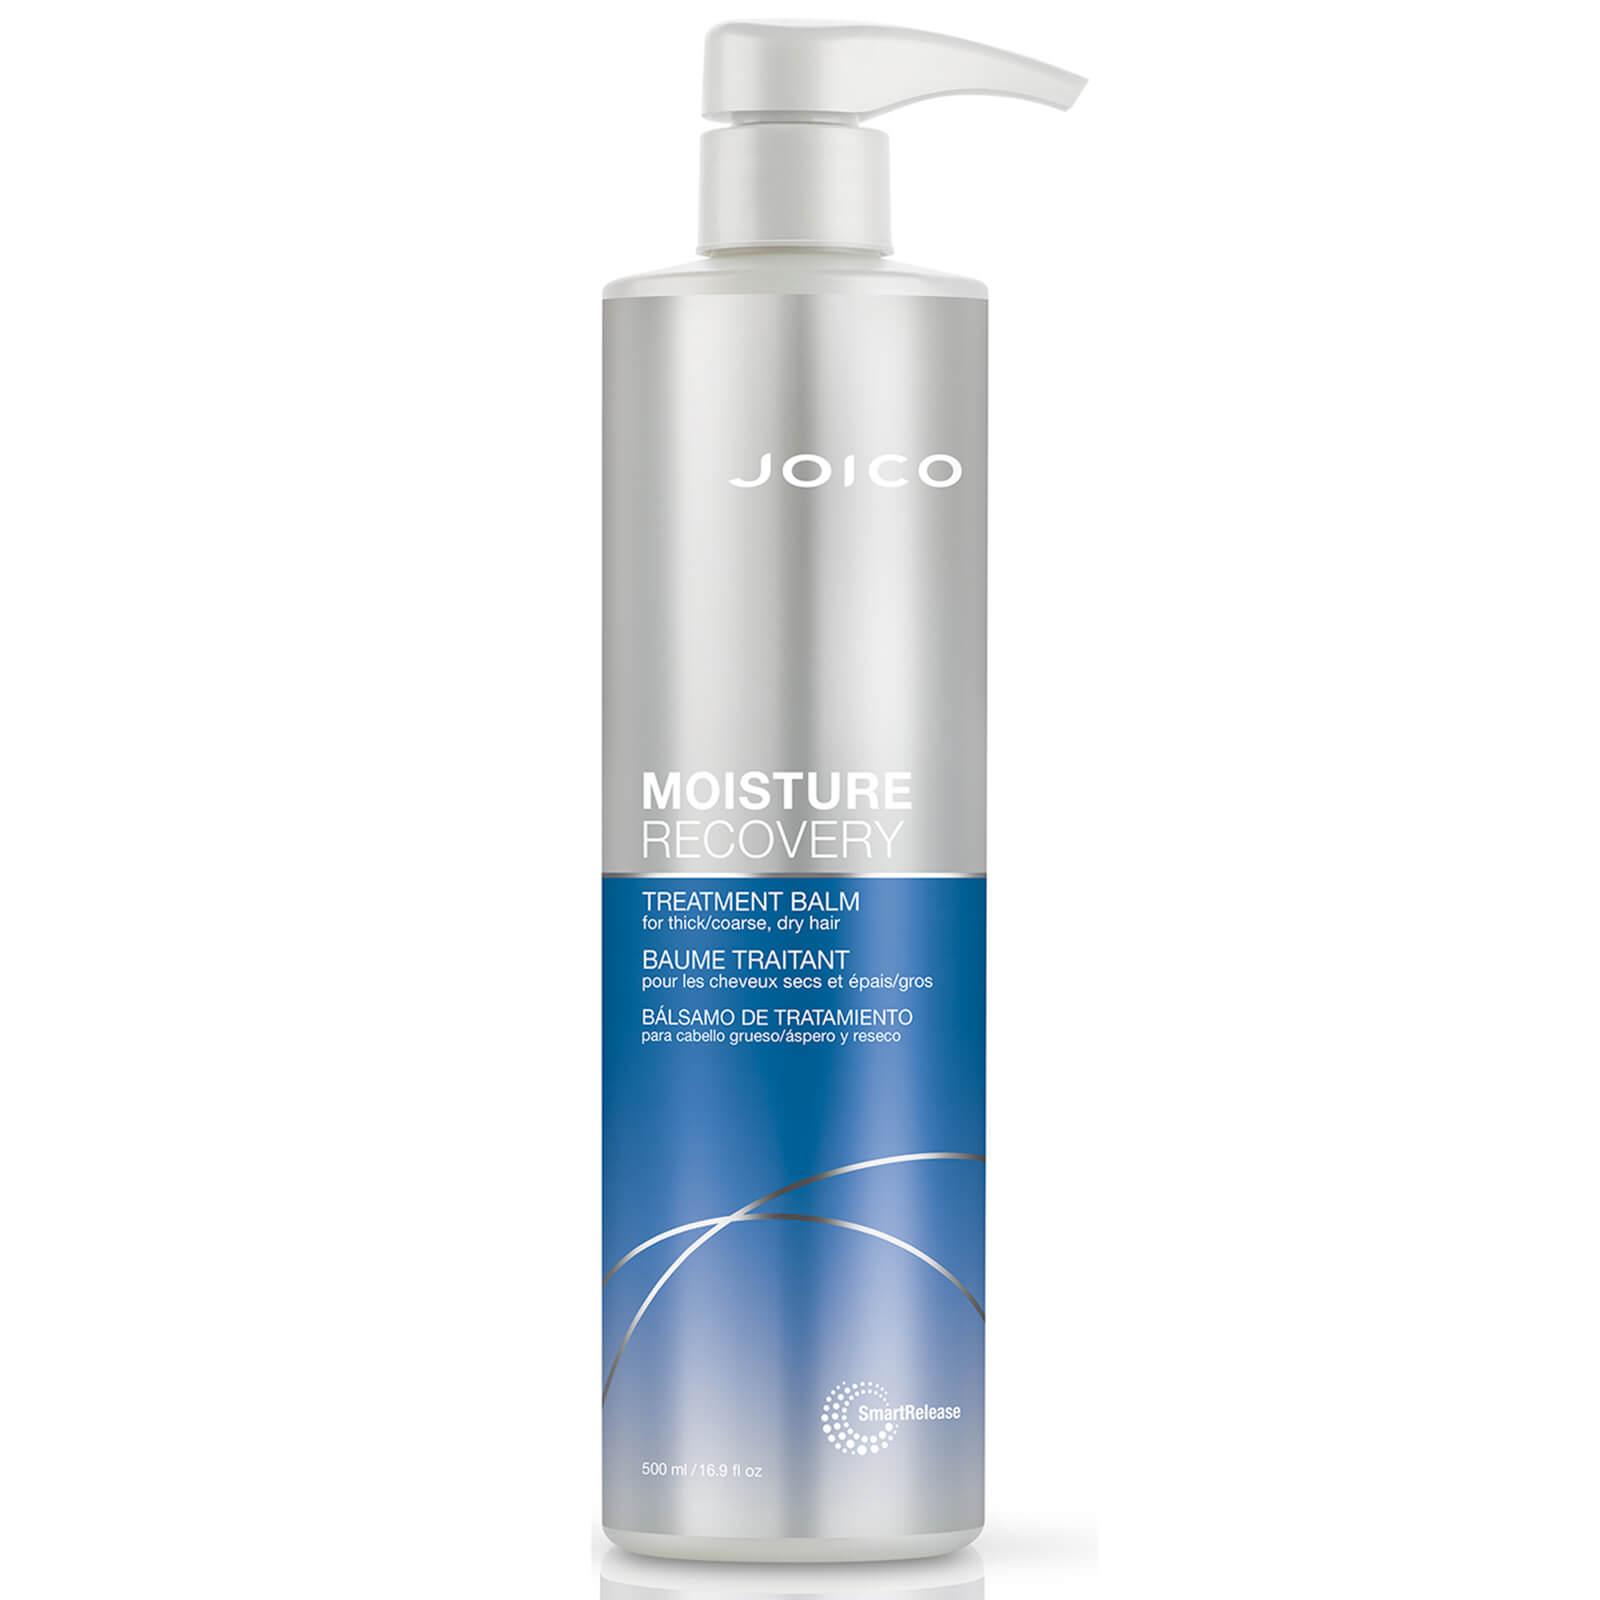 Купить Joico Moisture Recovery Treatment Balm For Thick-Coarse, Dry Hair 500ml